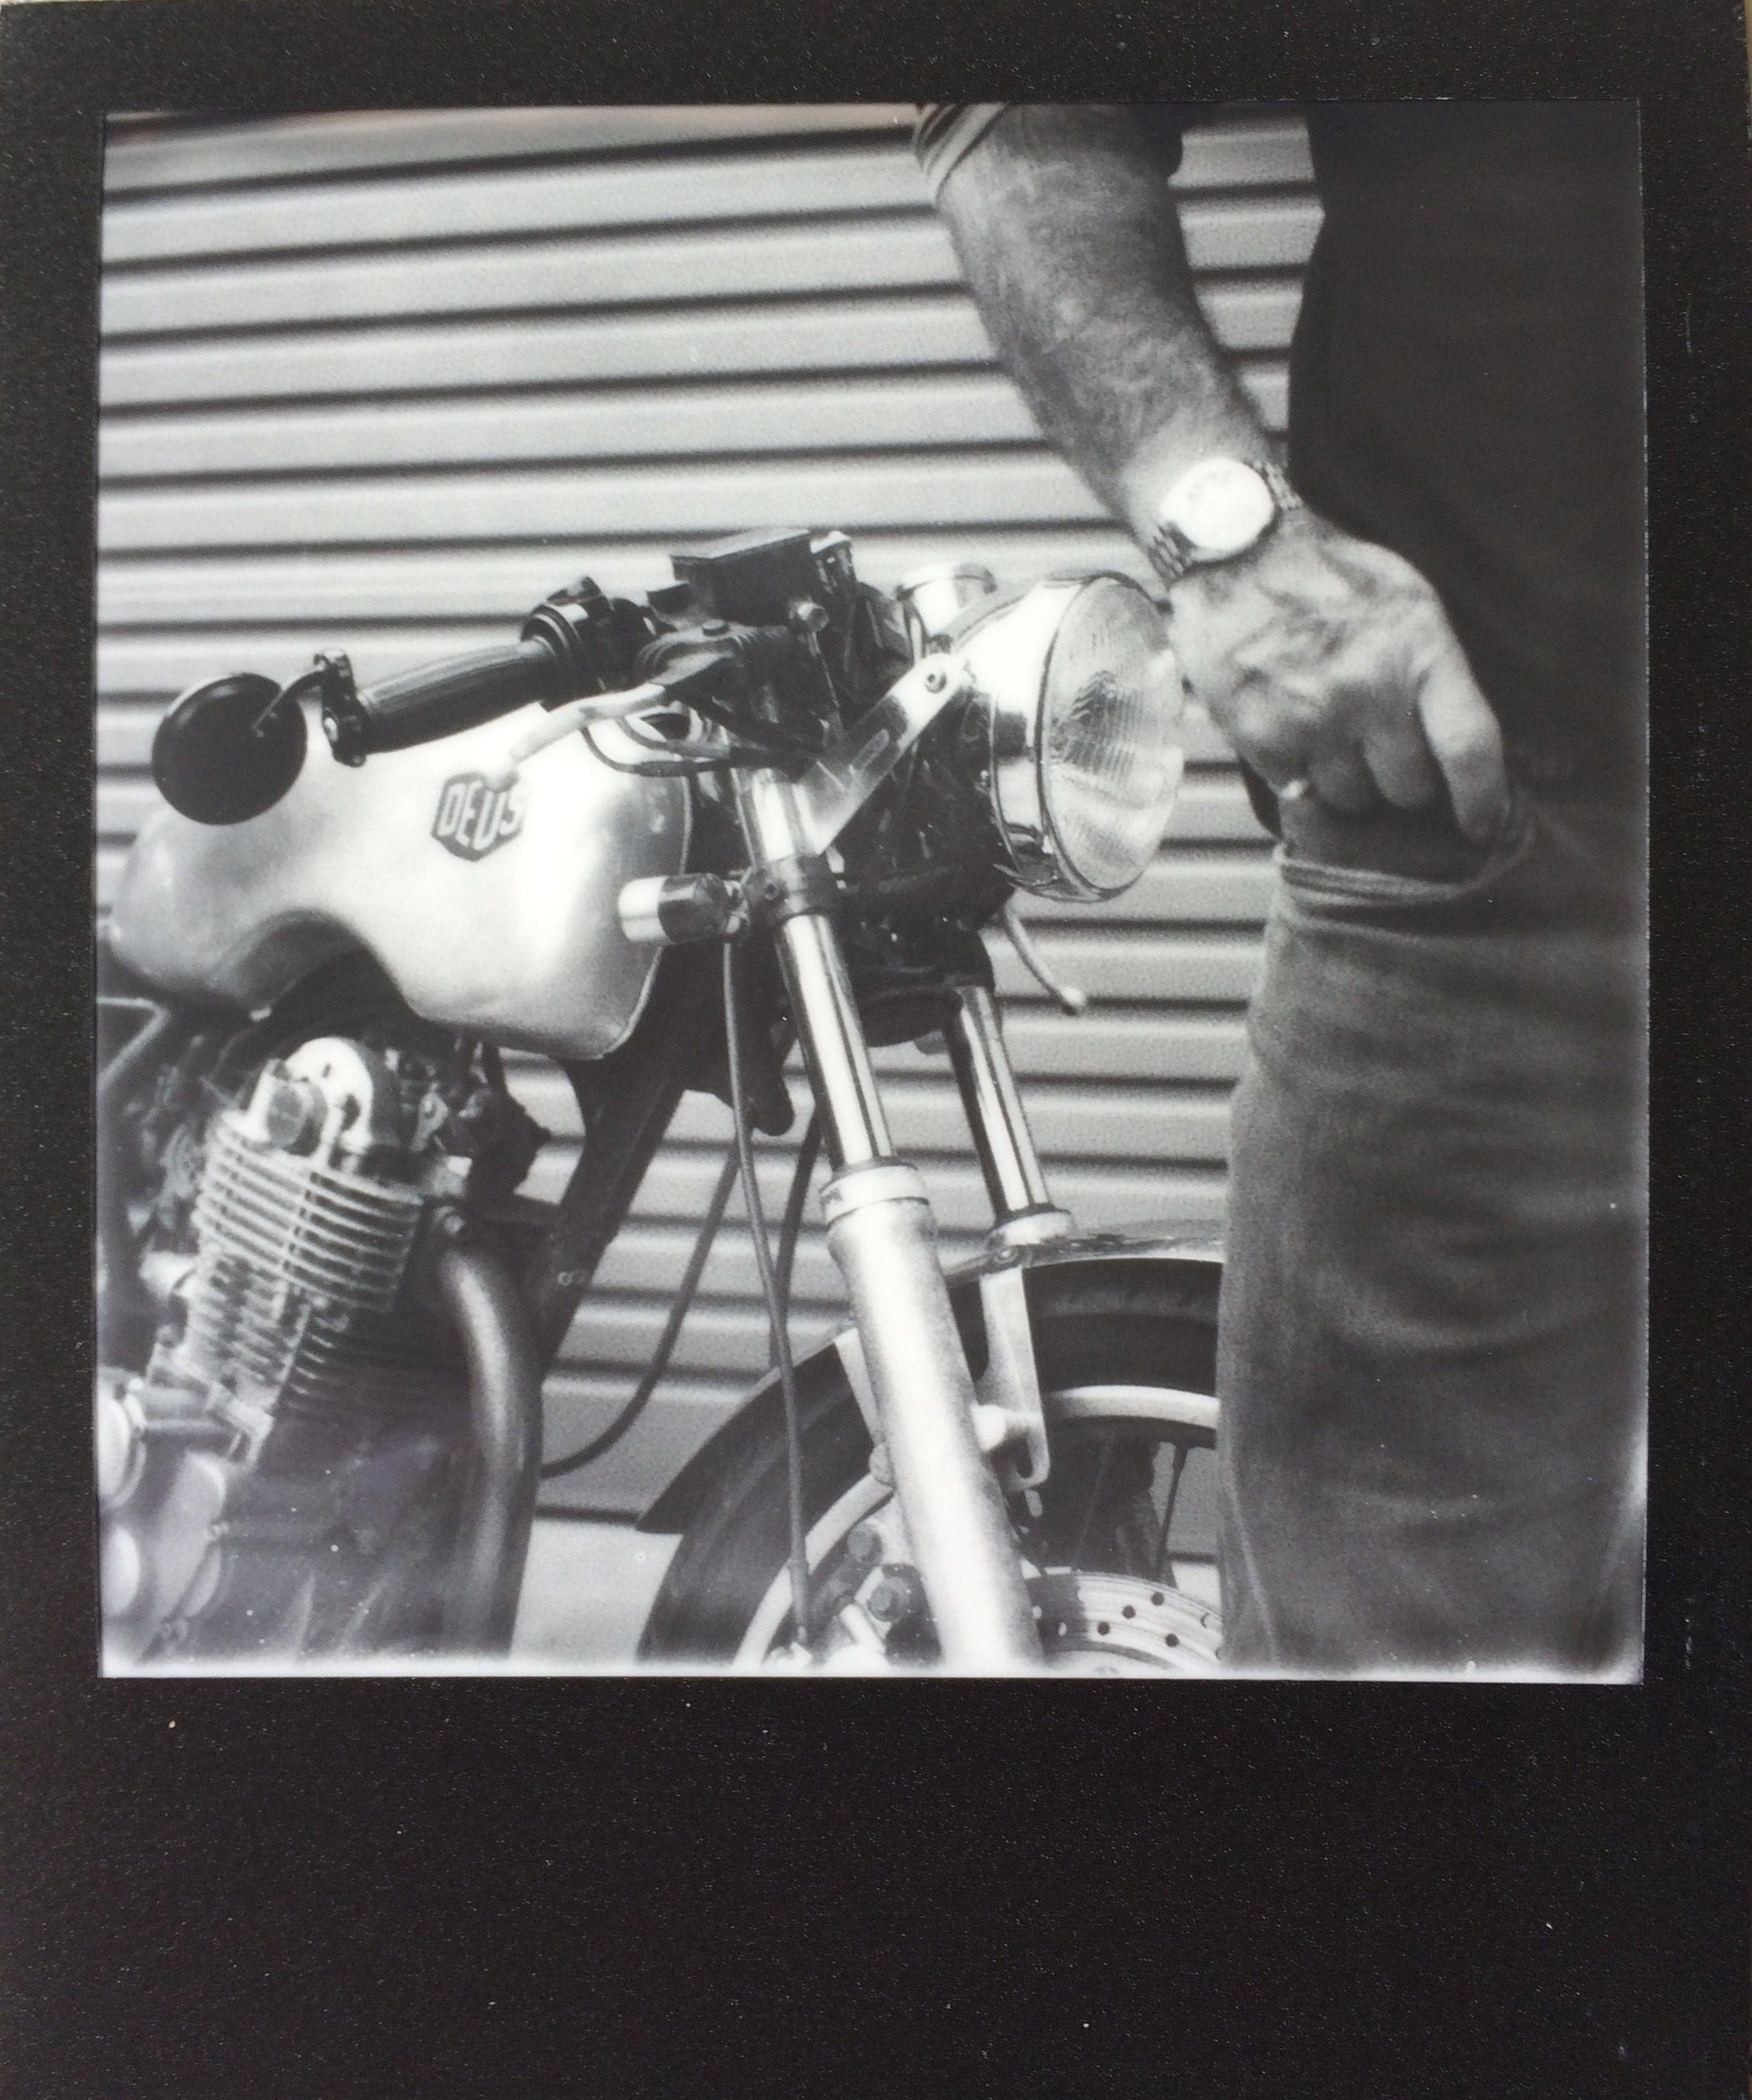 Polaroid SX70 Impossible SX70 B&W Film Black Frame